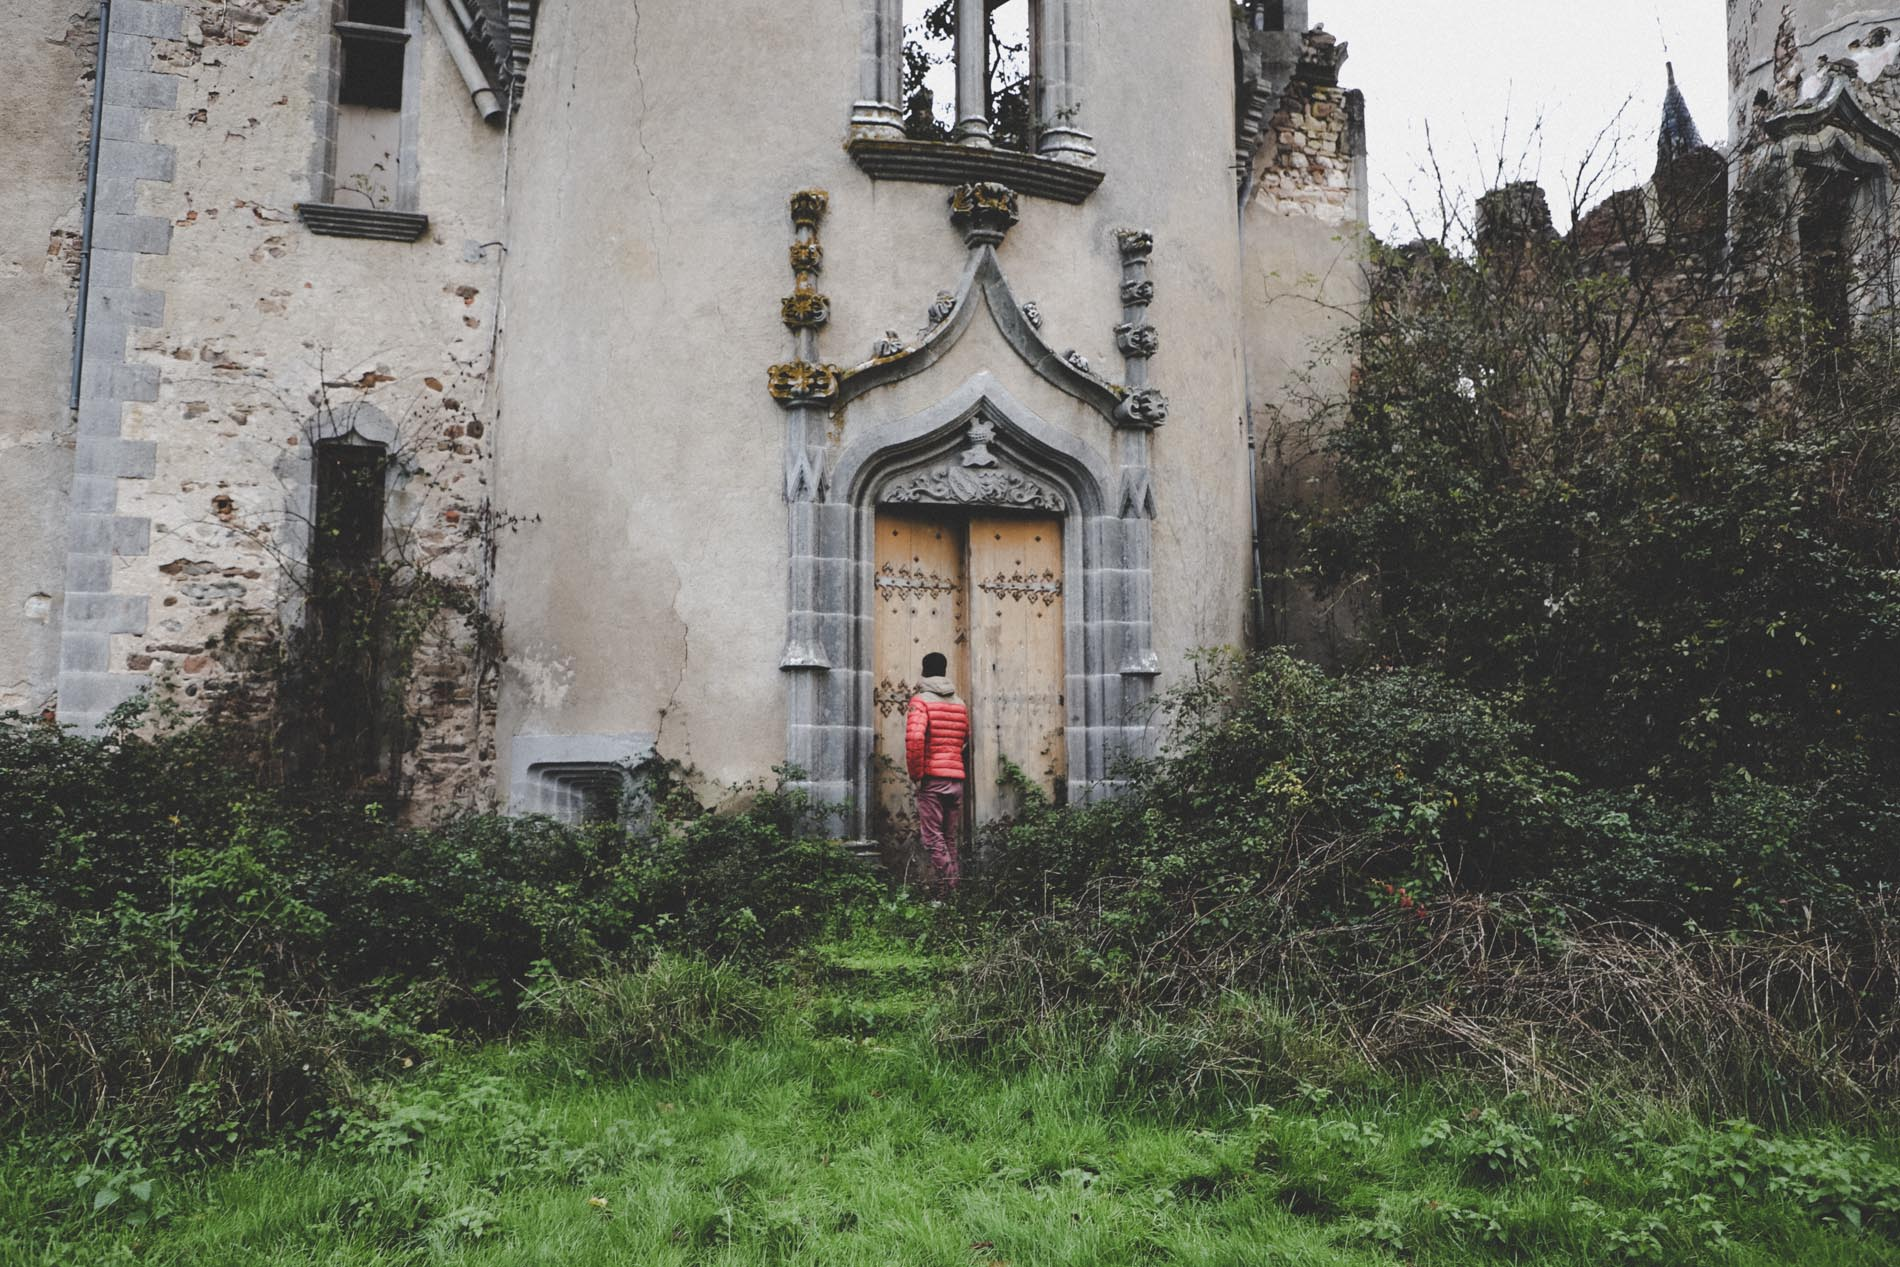 Bagnac, Haute-Vienne